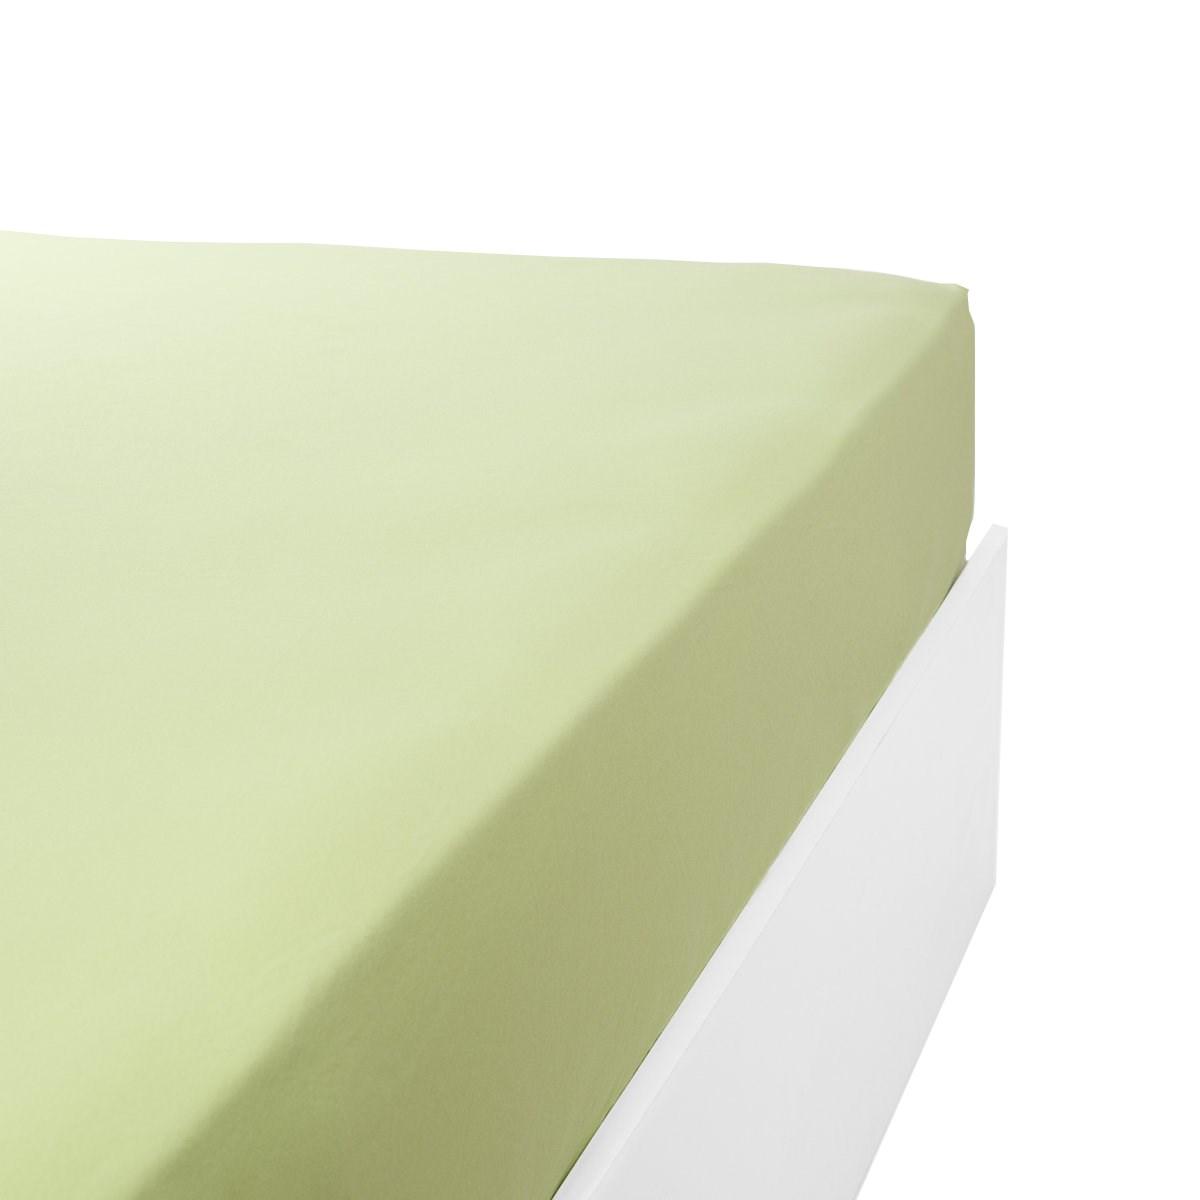 Drap housse flanelle en Molleton Vert anis 70x190 cm